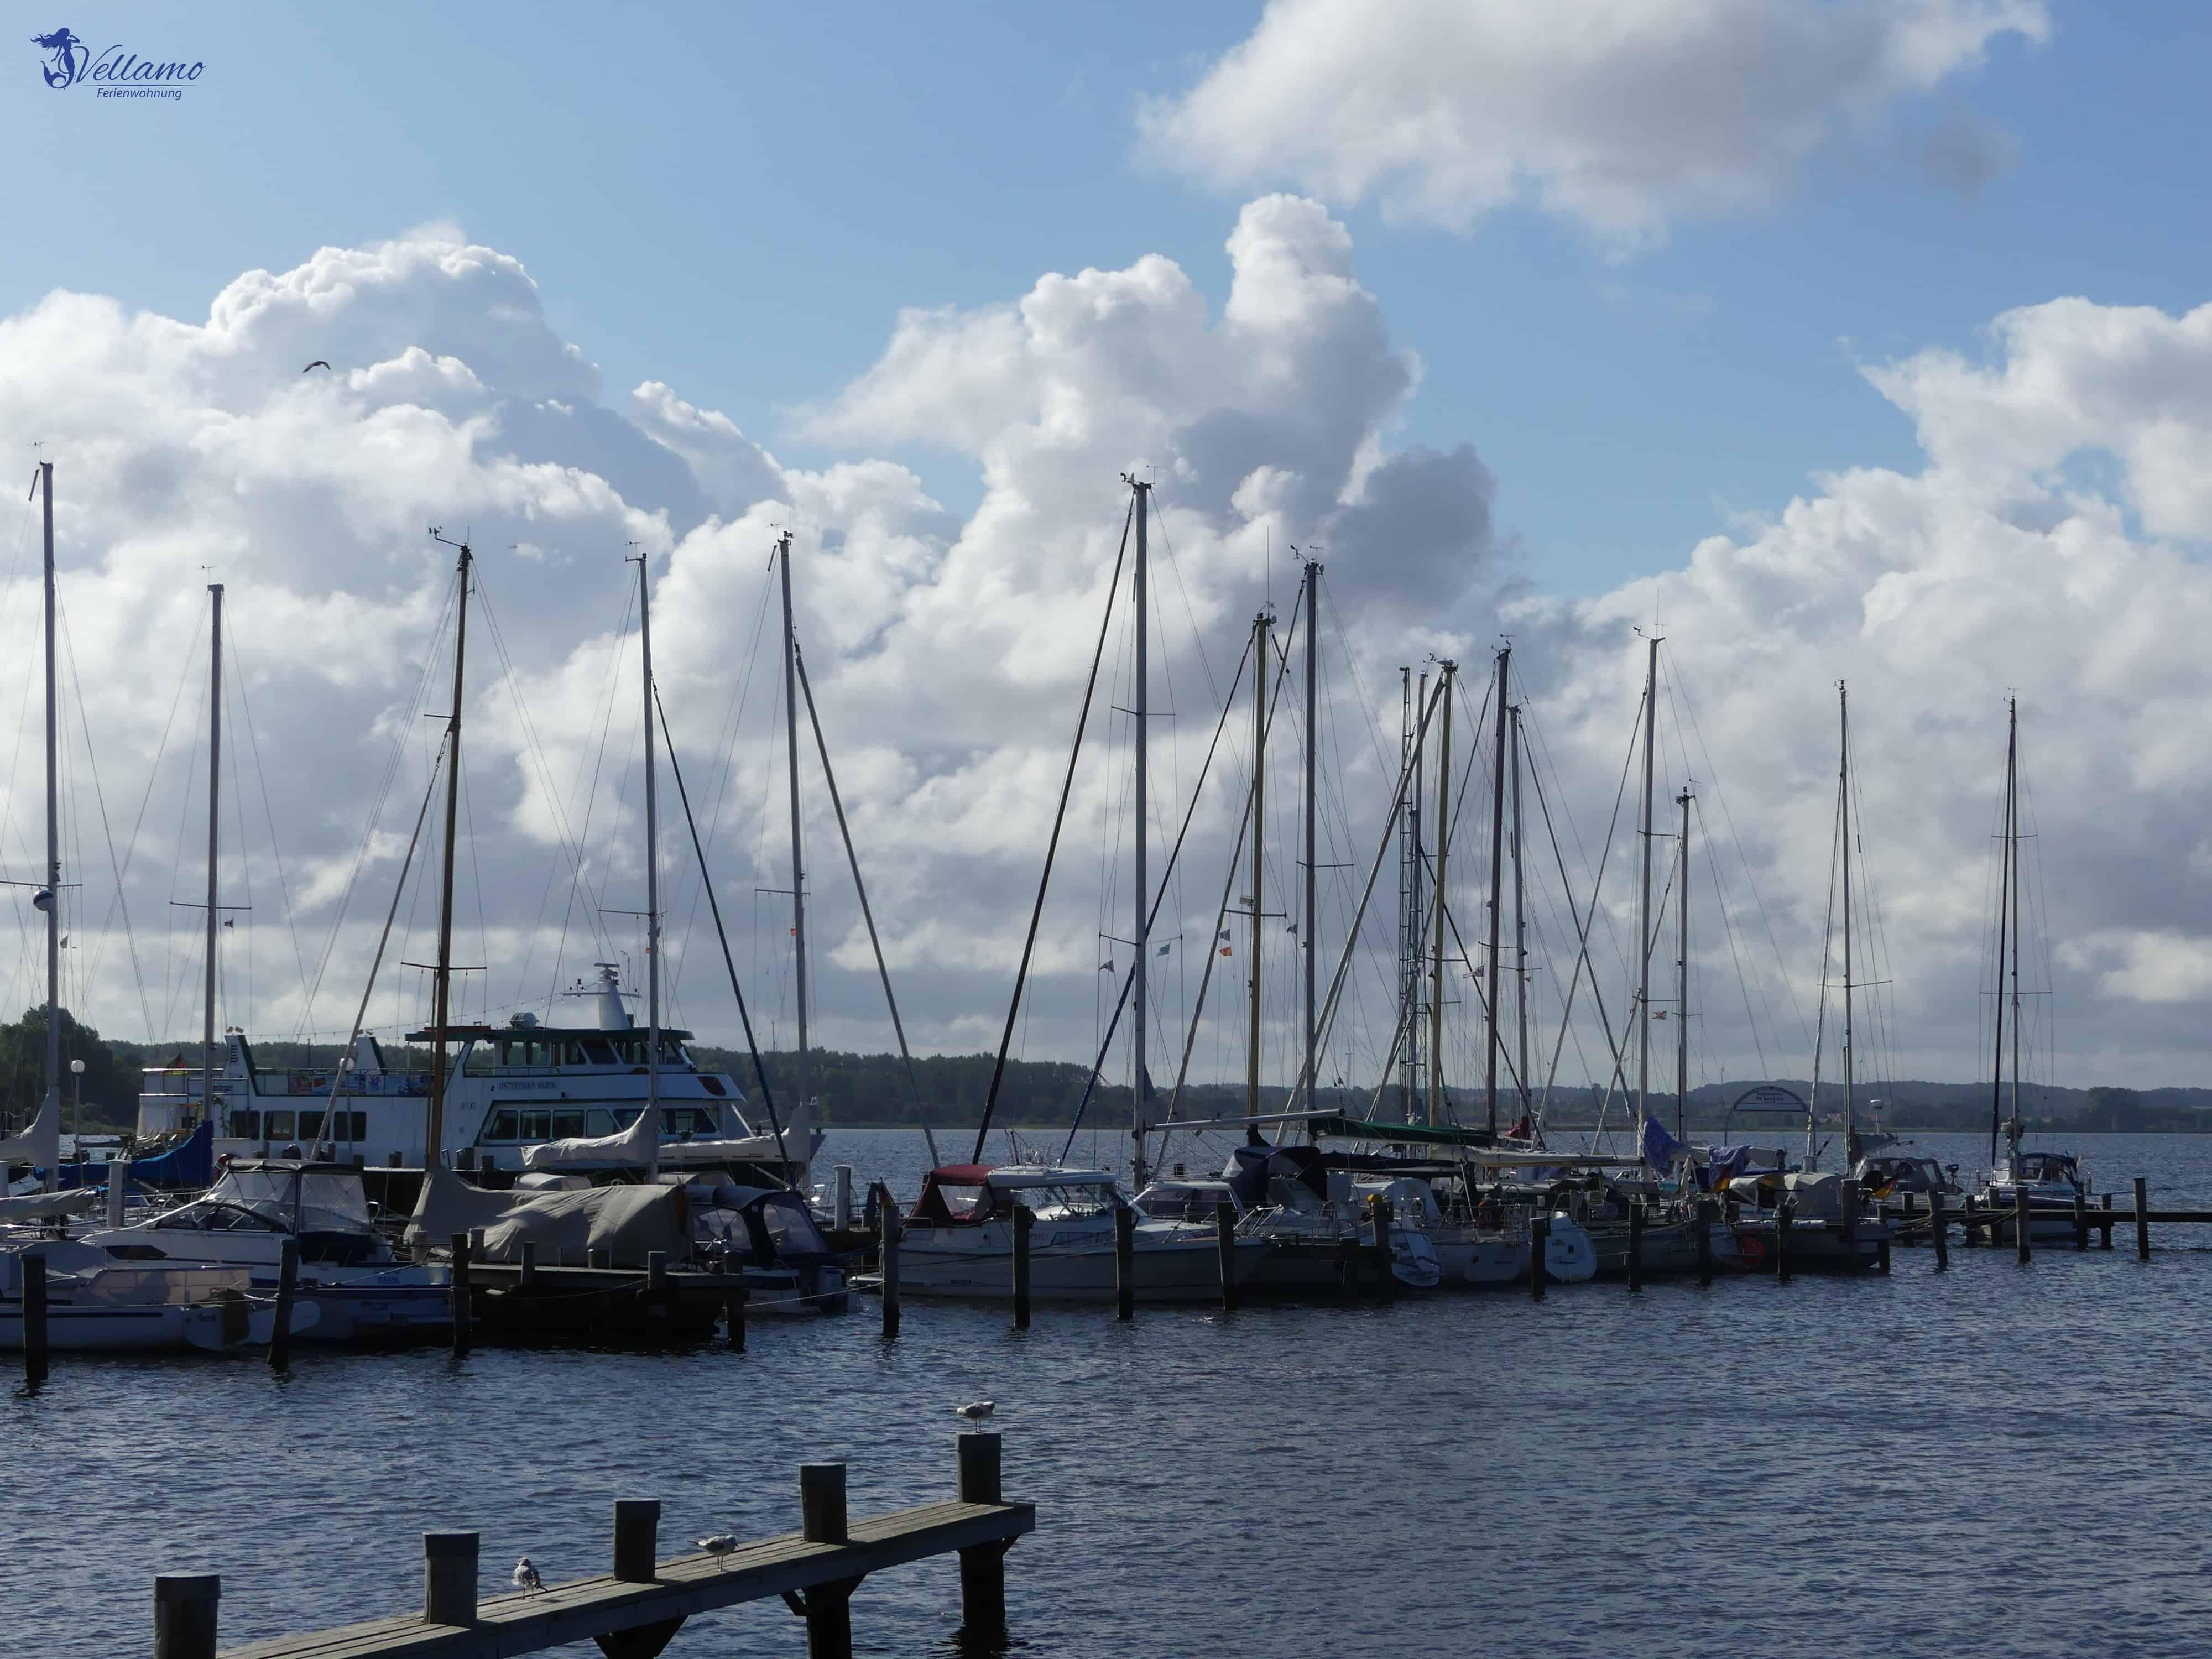 Ostseebad Rerik Bilder - Hafen Rerik